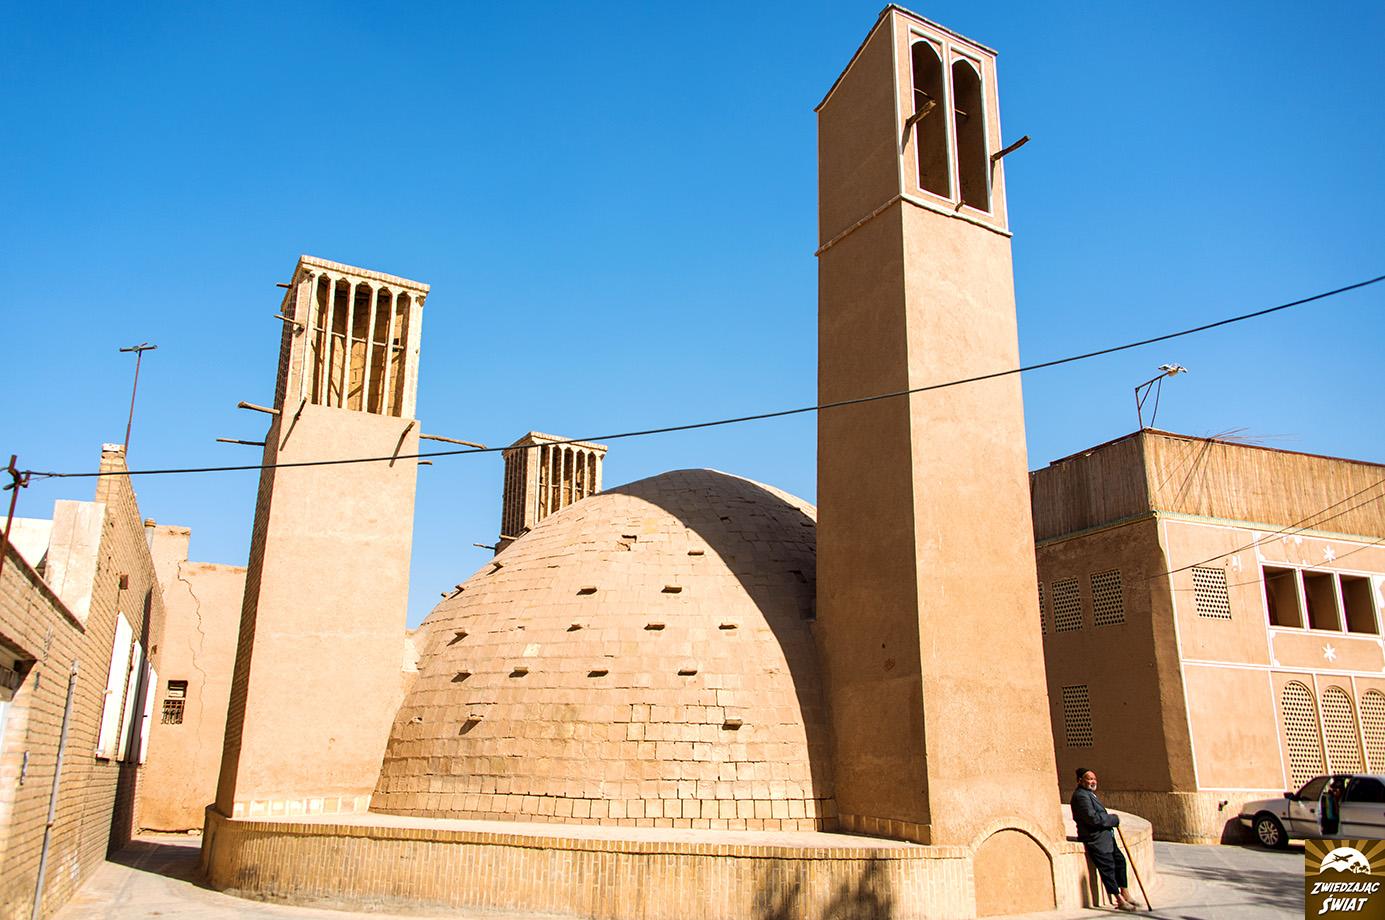 Jazd, Iran